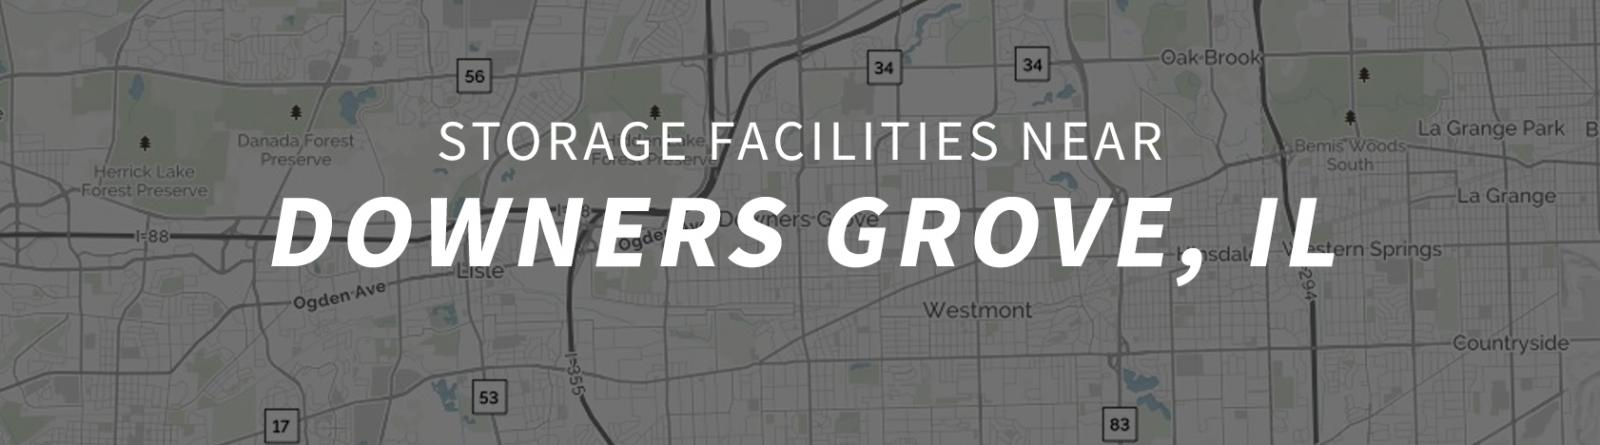 Genial 4 Storage Facilities Near Downers Grove, IL